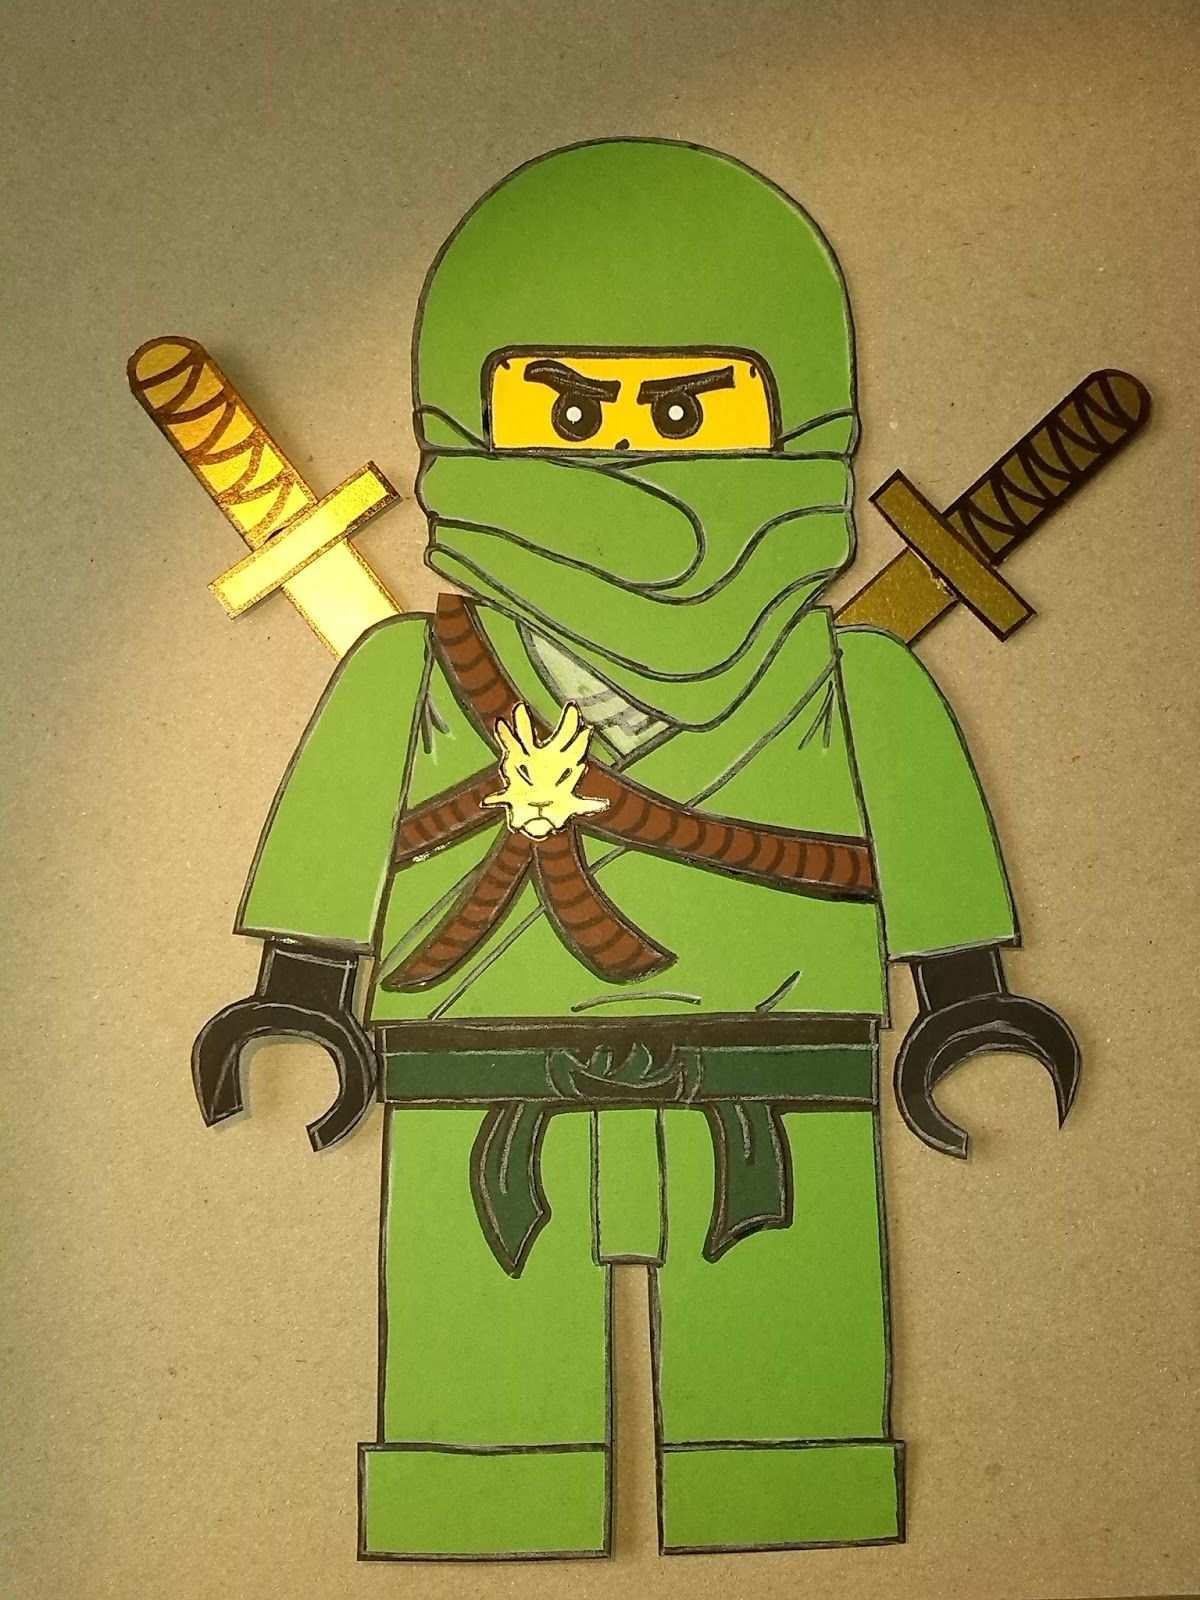 Ein Bastel Set Fur Ninjago Schultuten Ninjago Schultute Schultute Basteln Schultute